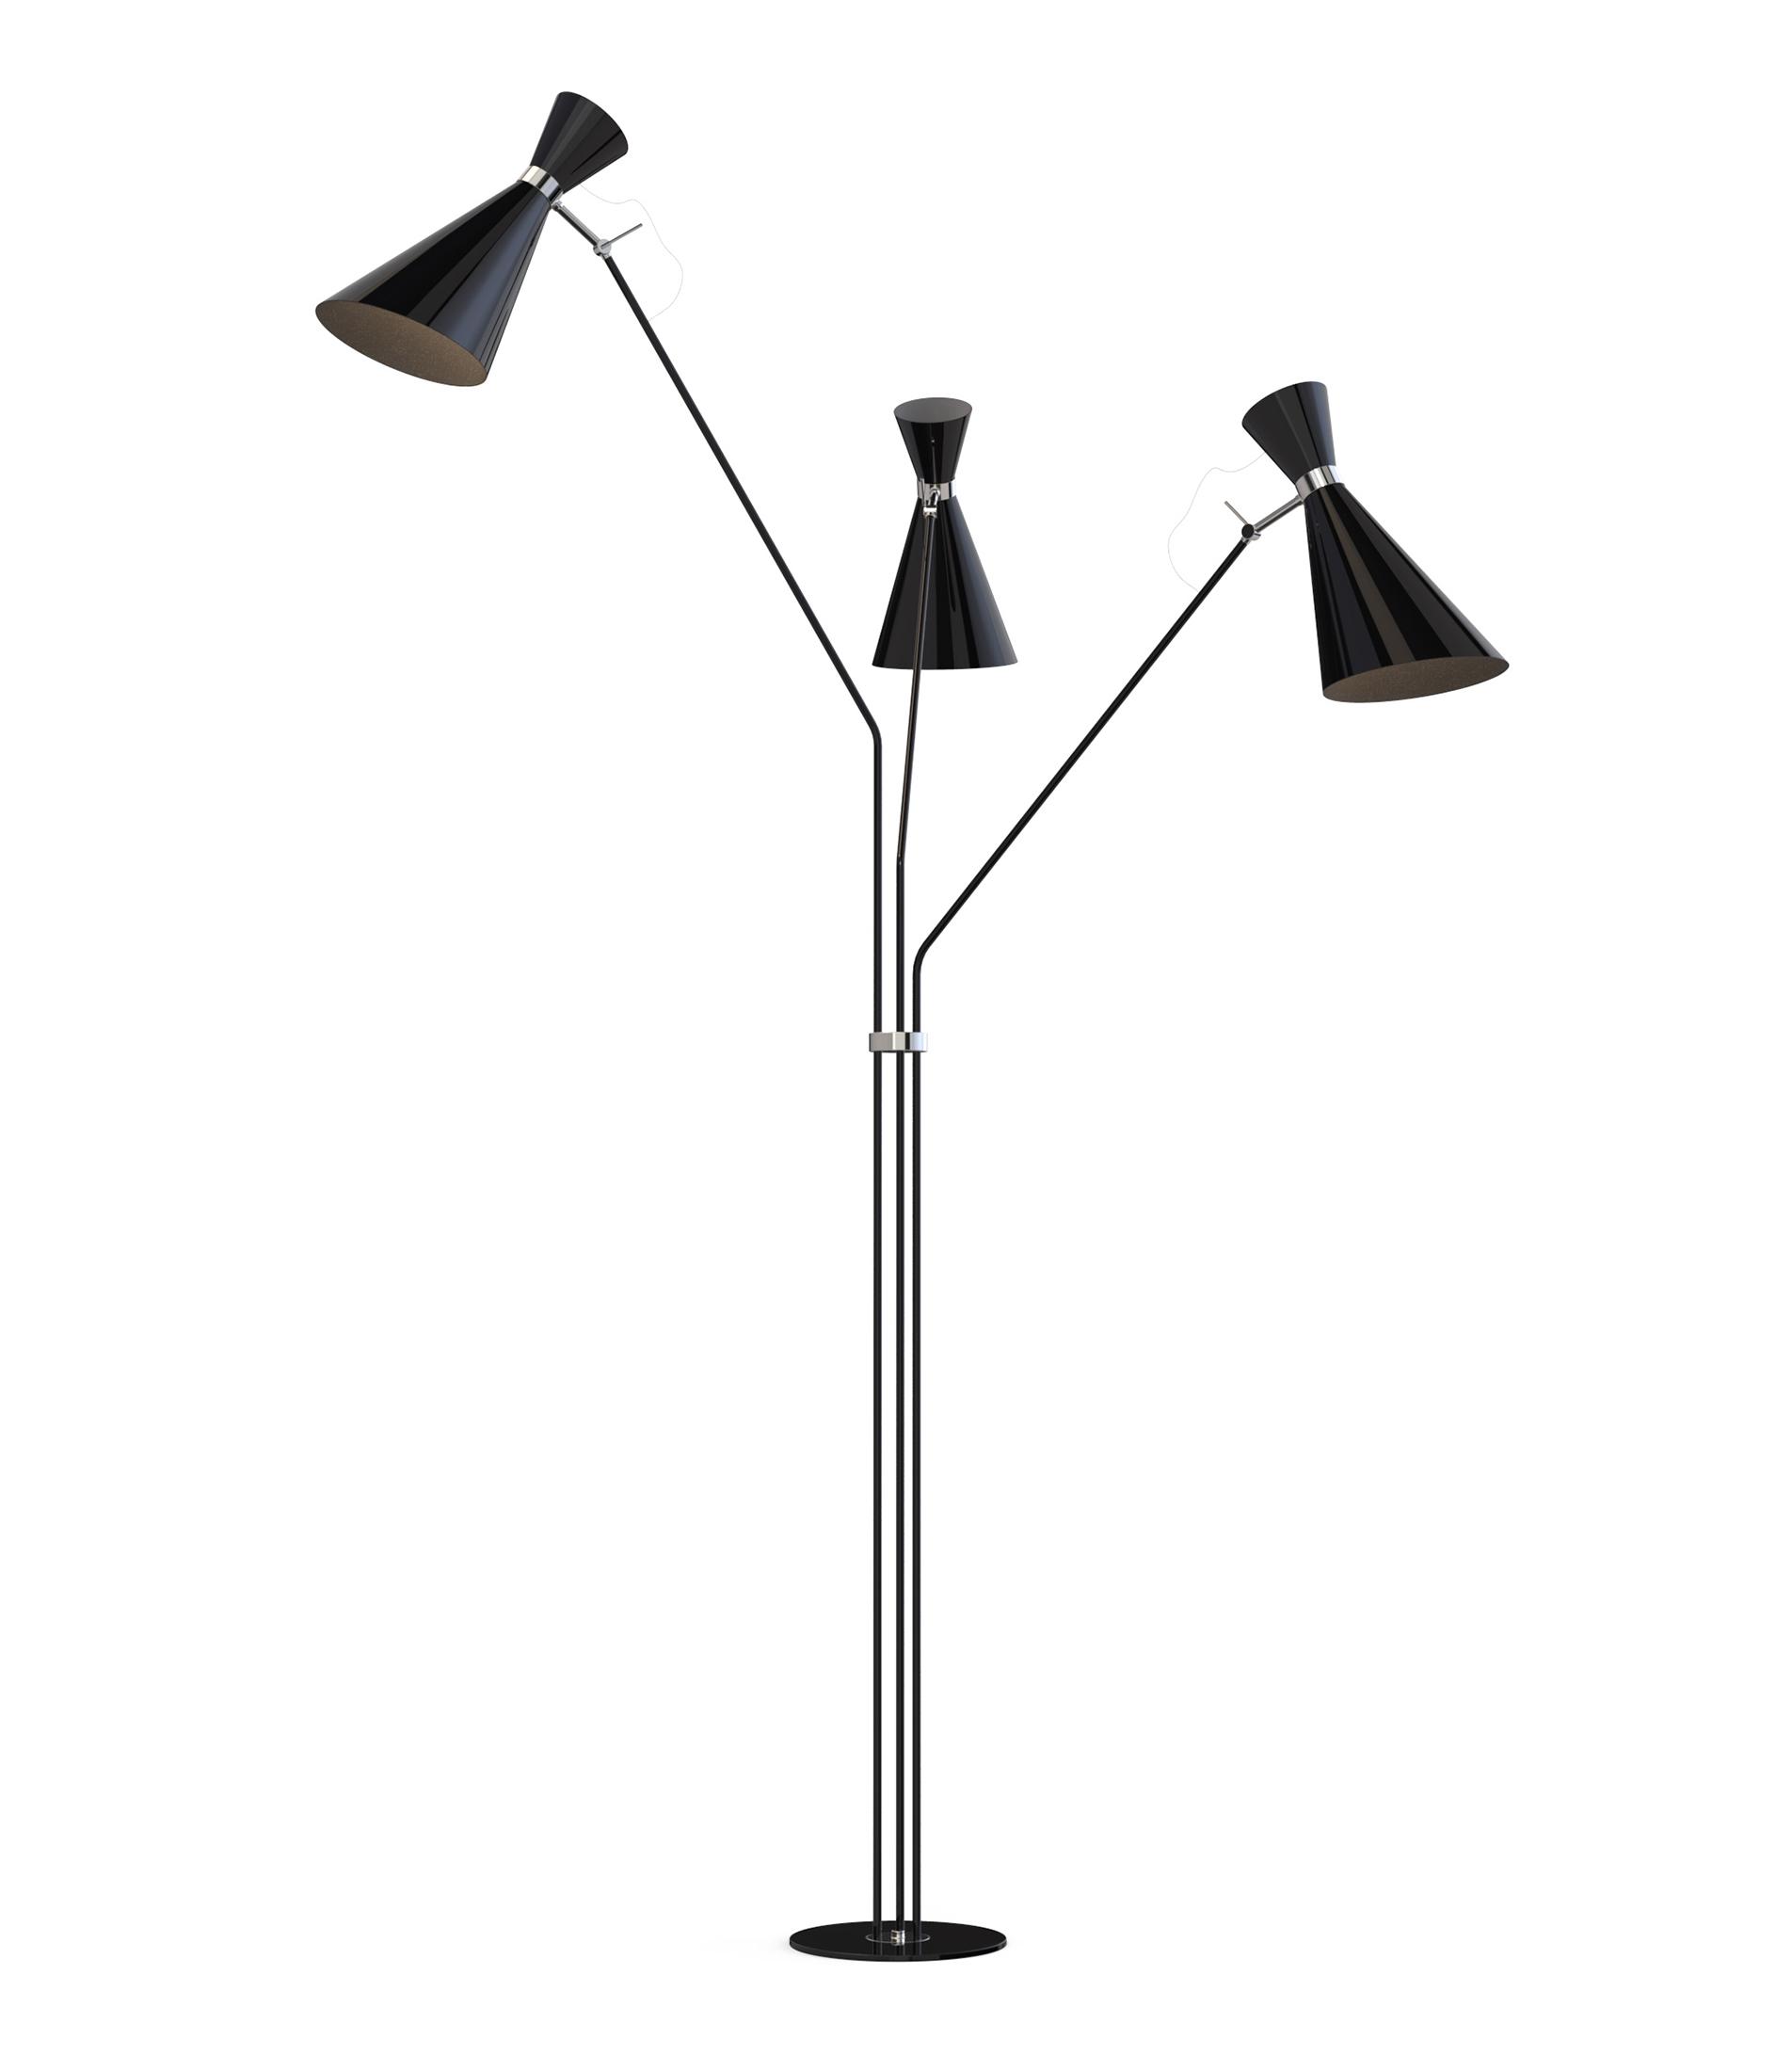 Simone Floor Lamp simone floor lamp Enter In The Jazzy World  Of Simone Floor Lamp! EnterIn The Jazzy World Of Simone Floor Lamp4